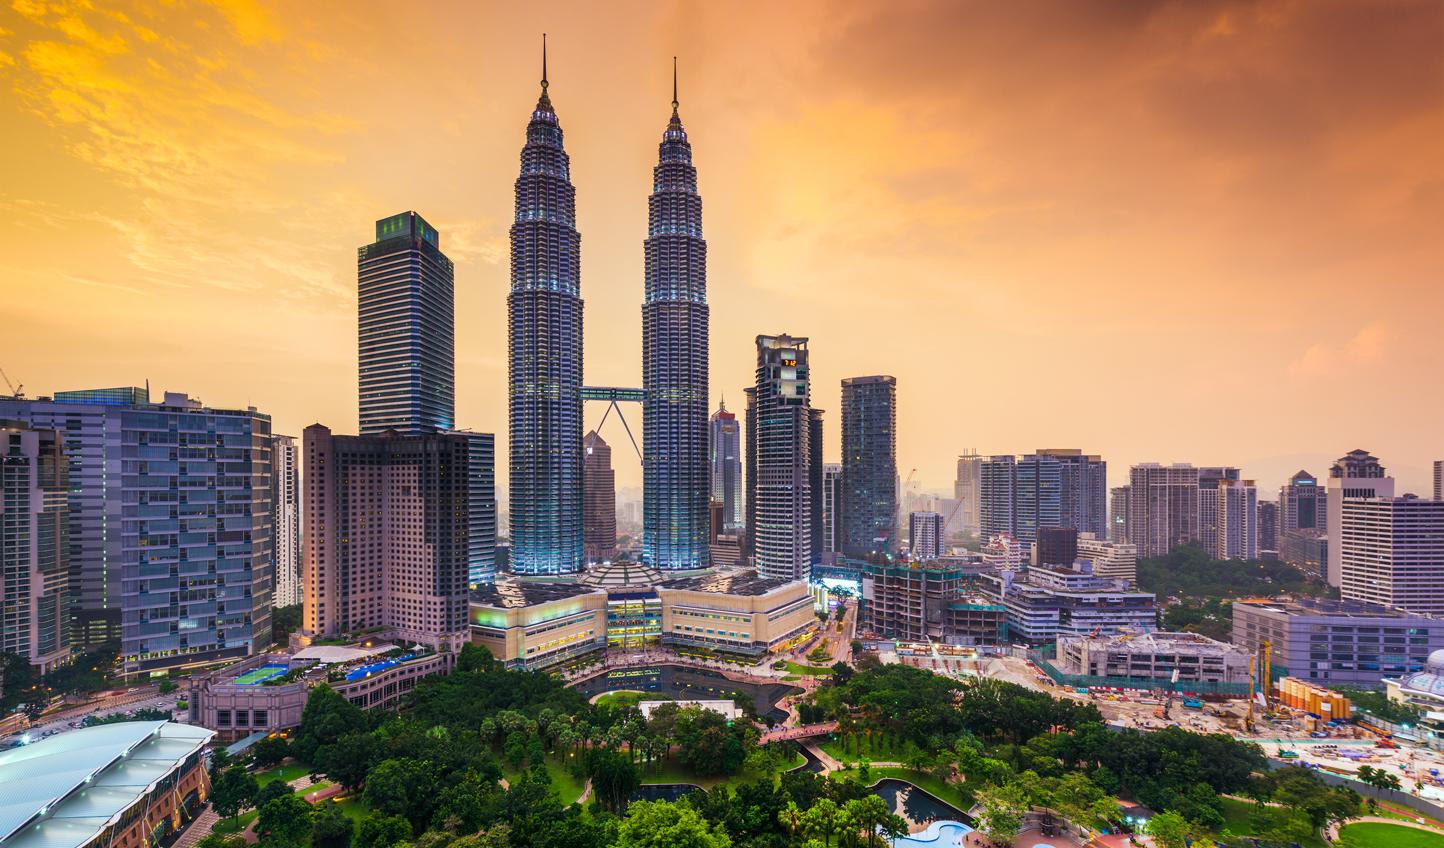 The impressive Kuala Lumpur skyline